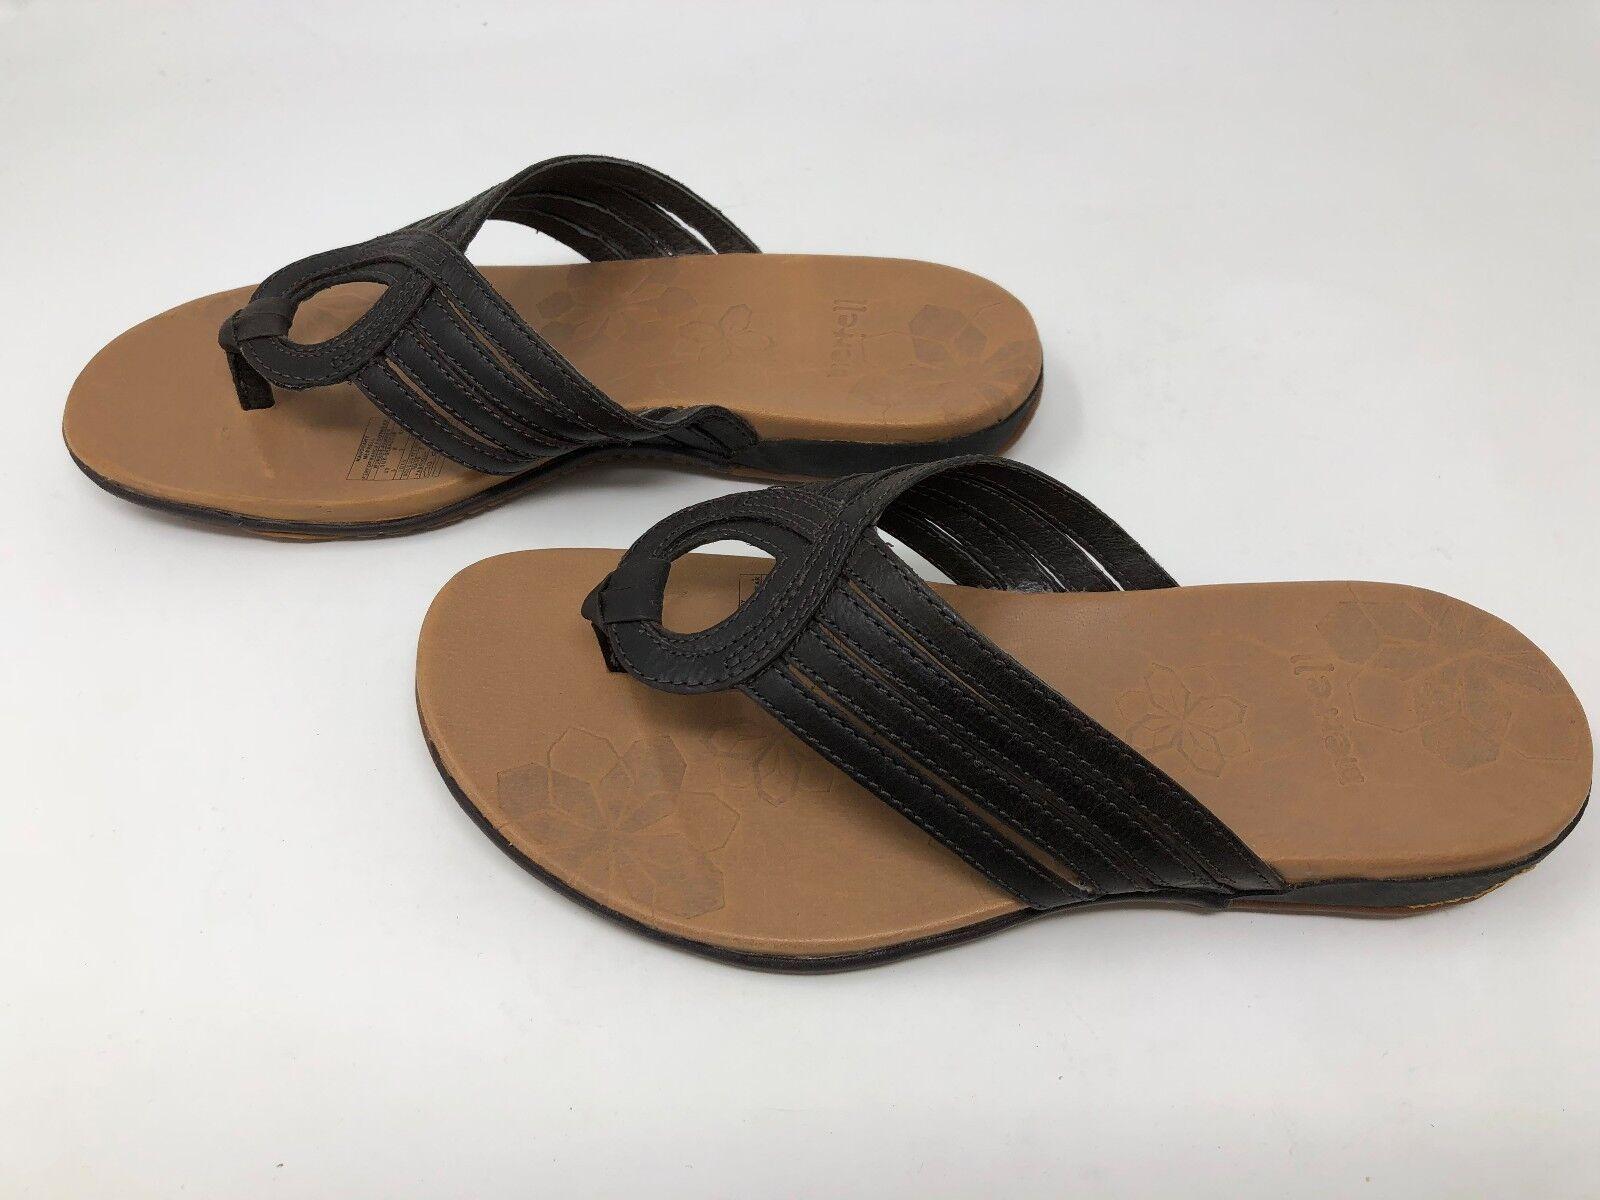 Wouomo Merrell Lidia Mahogany Flip Flops Dimensione 5               20A